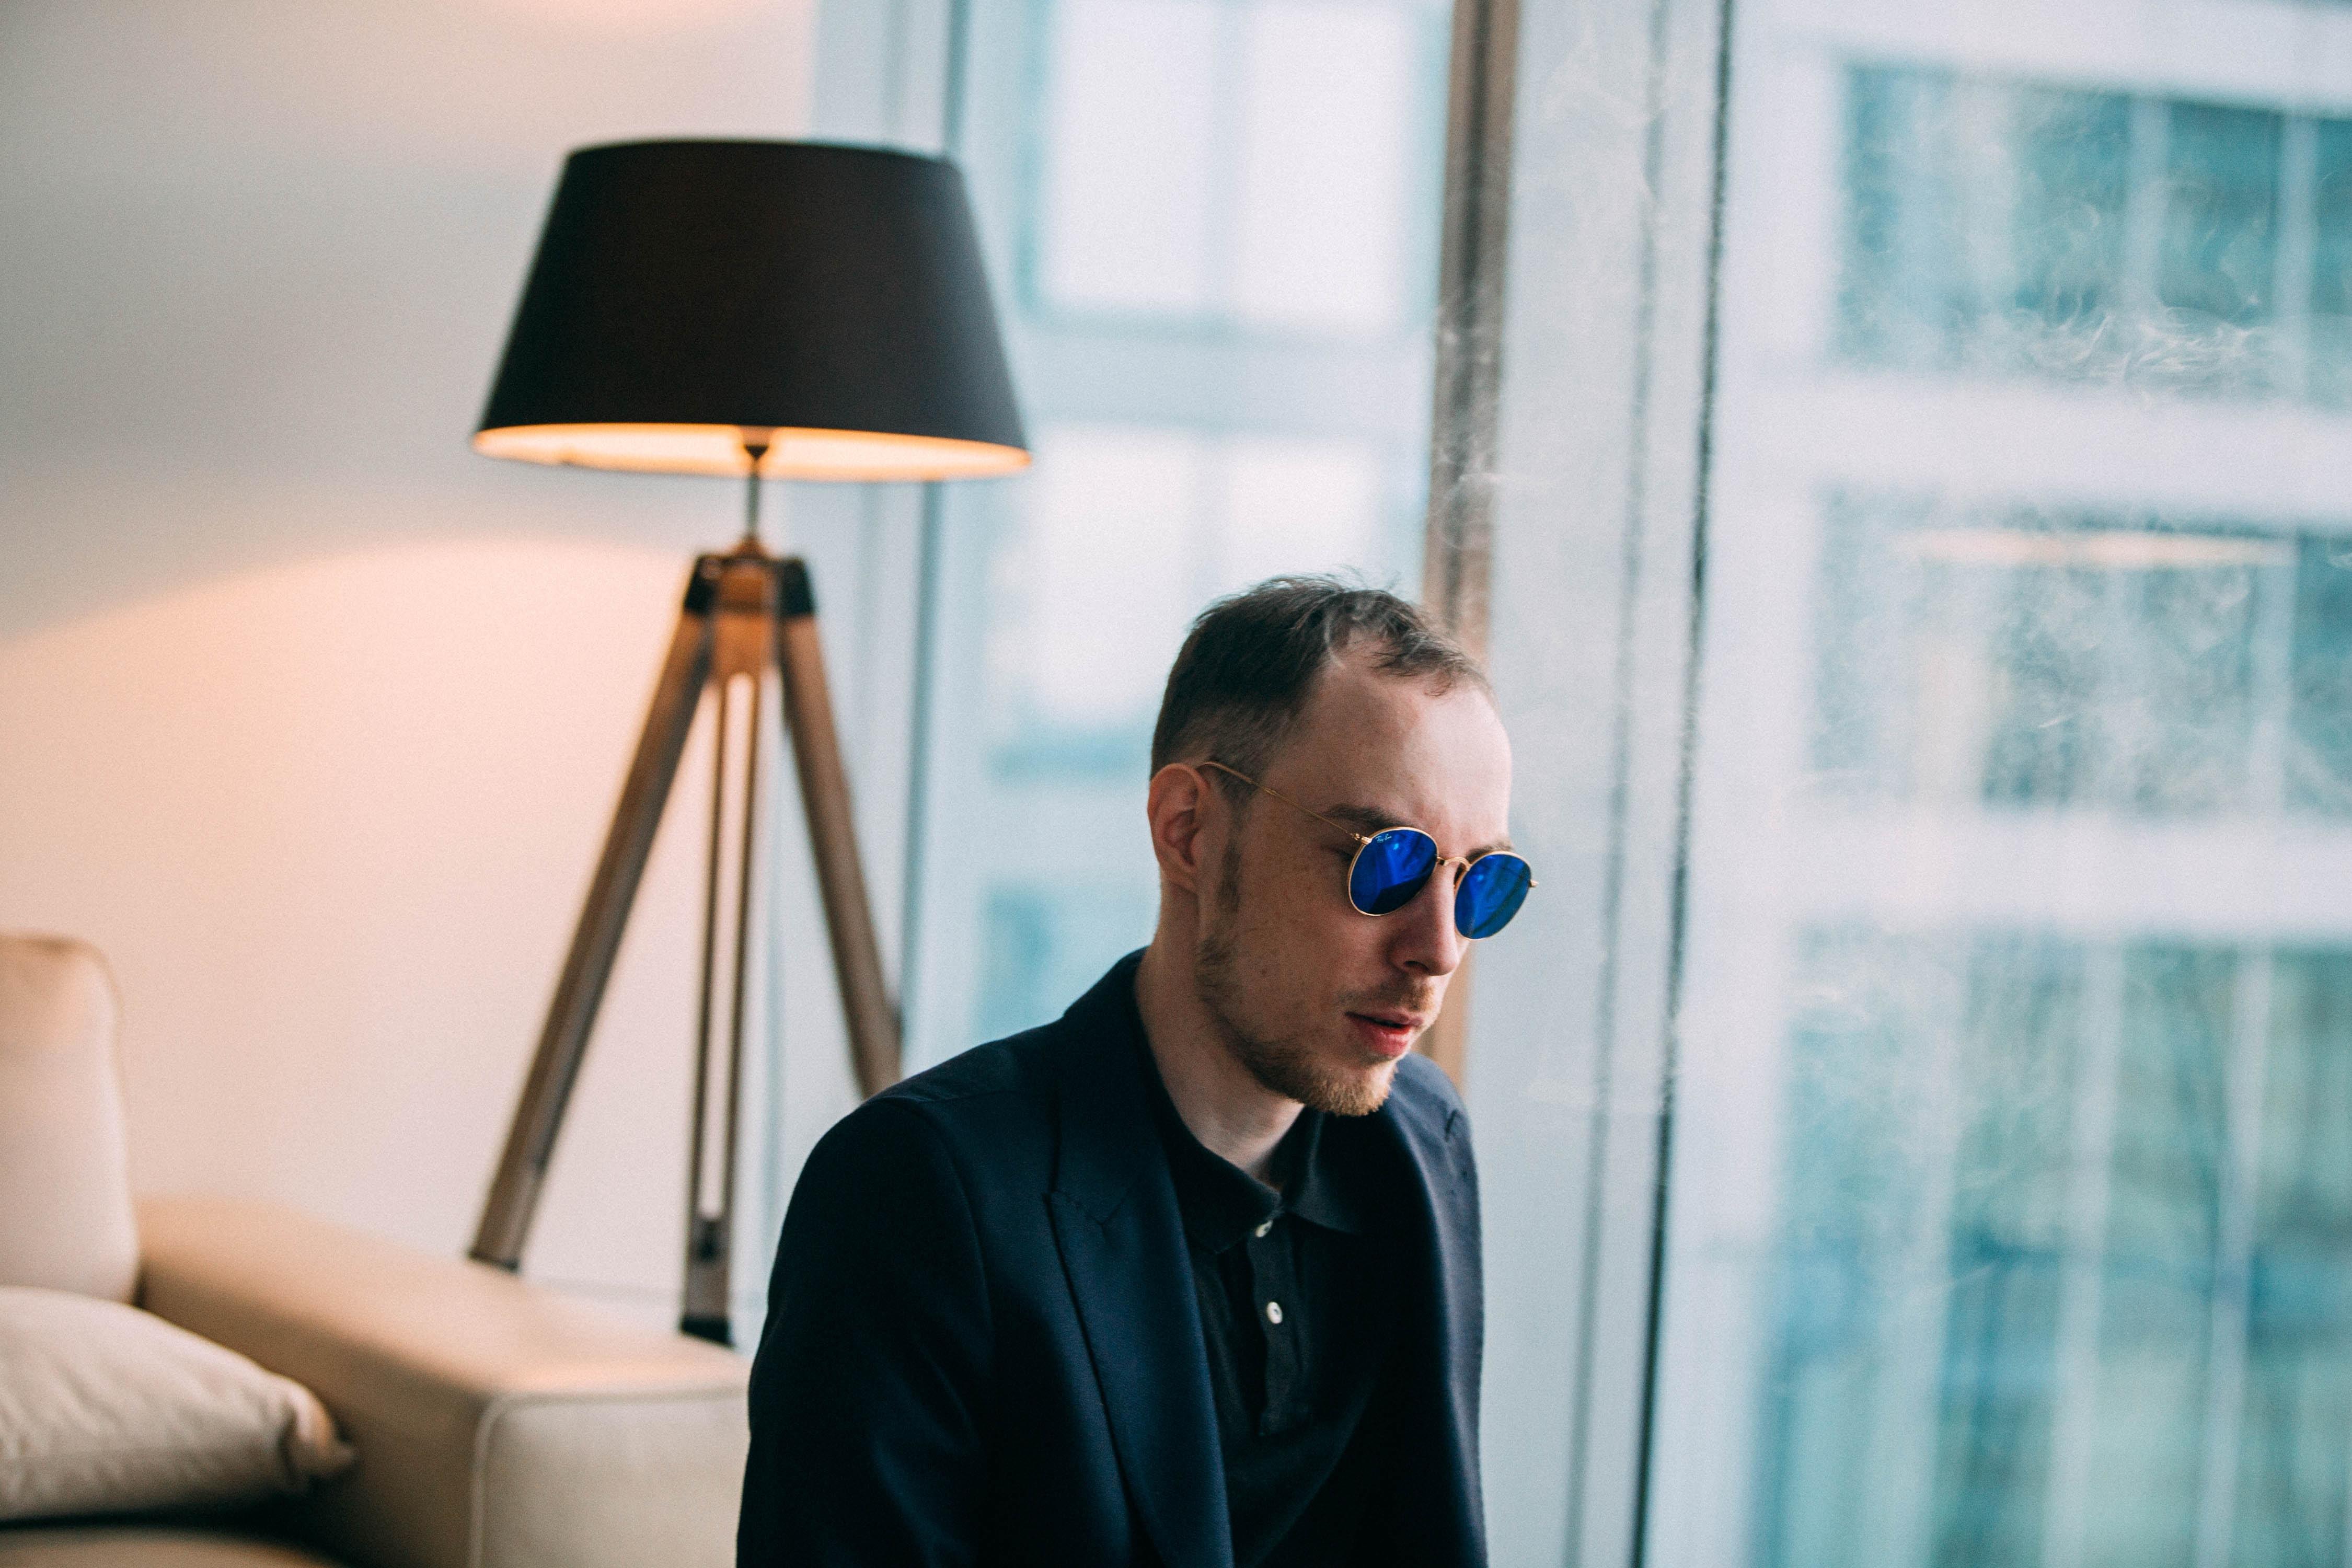 man wearing sunglasses near table lamp photo